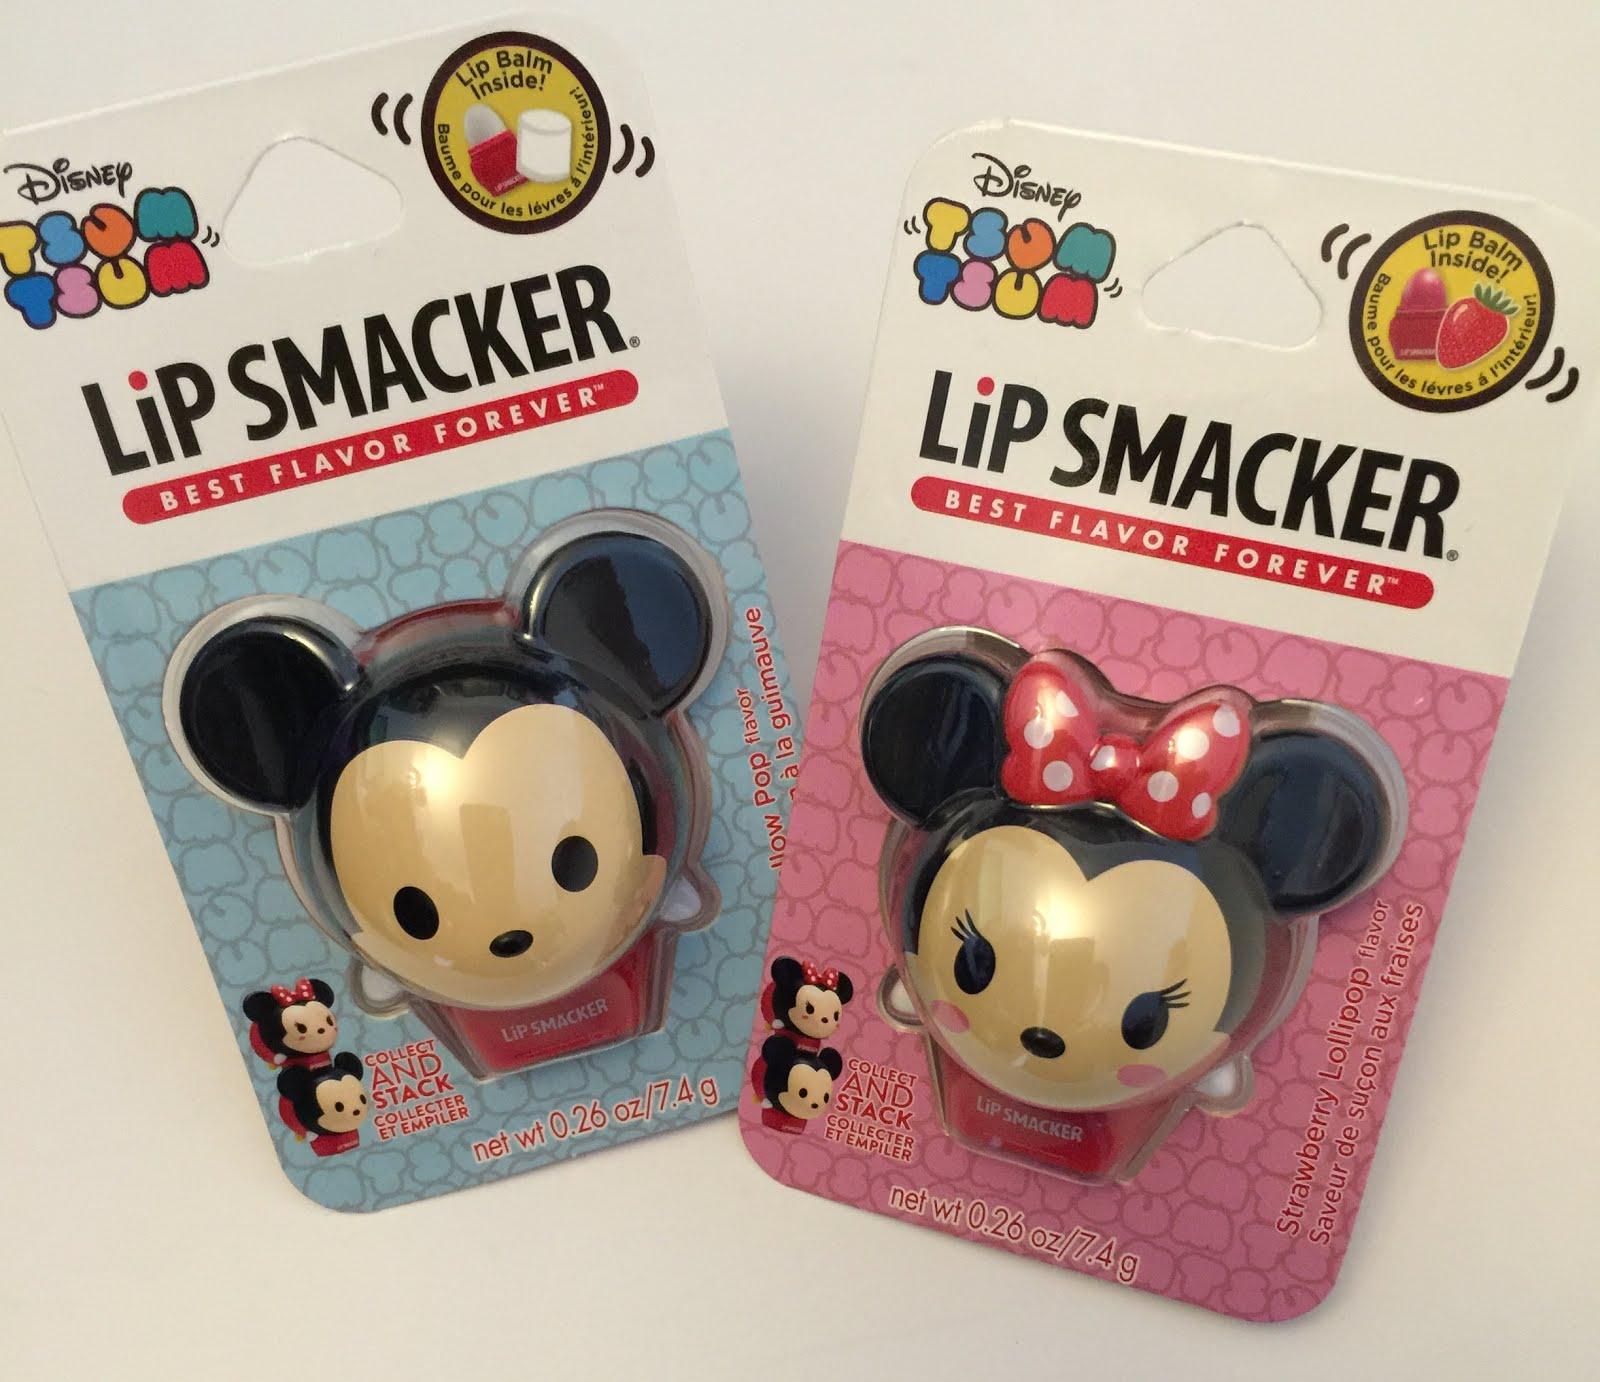 Tsum Lip Balm Winnie The Pooh Honey Pot by lip smacker #6